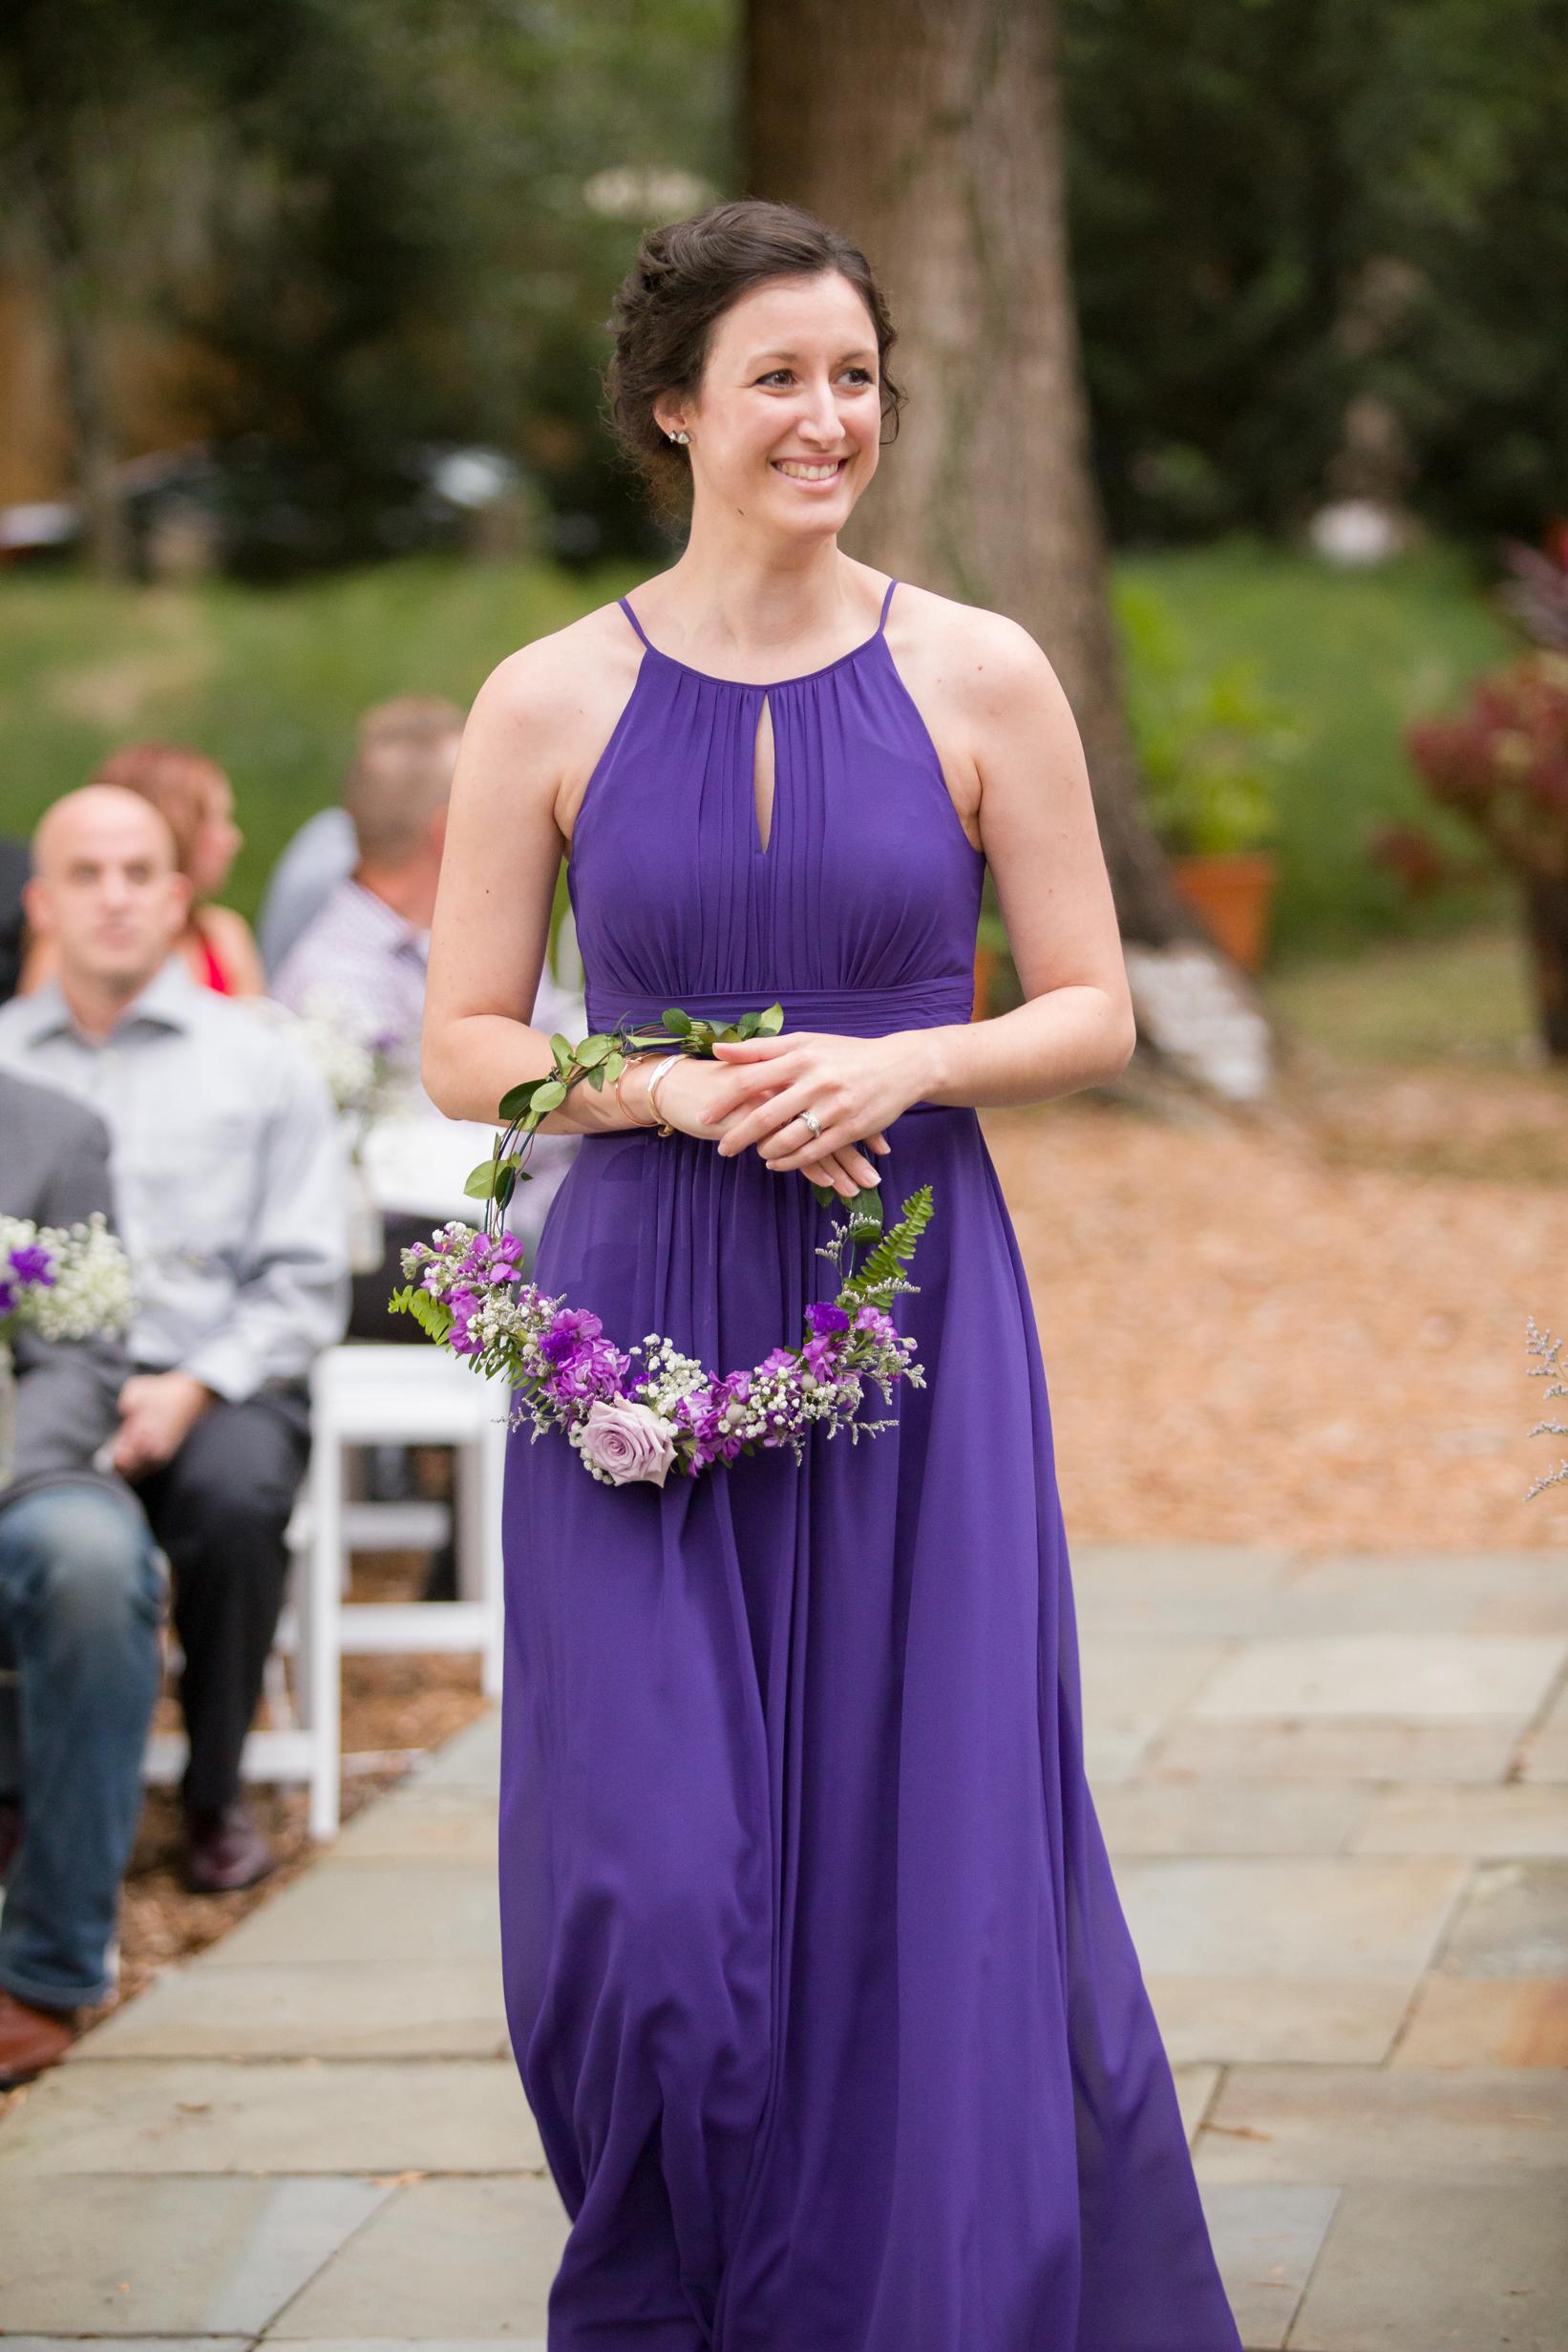 harmony-gardens-wedding-chamber-photography-moments-antoine-hart-18.jpg